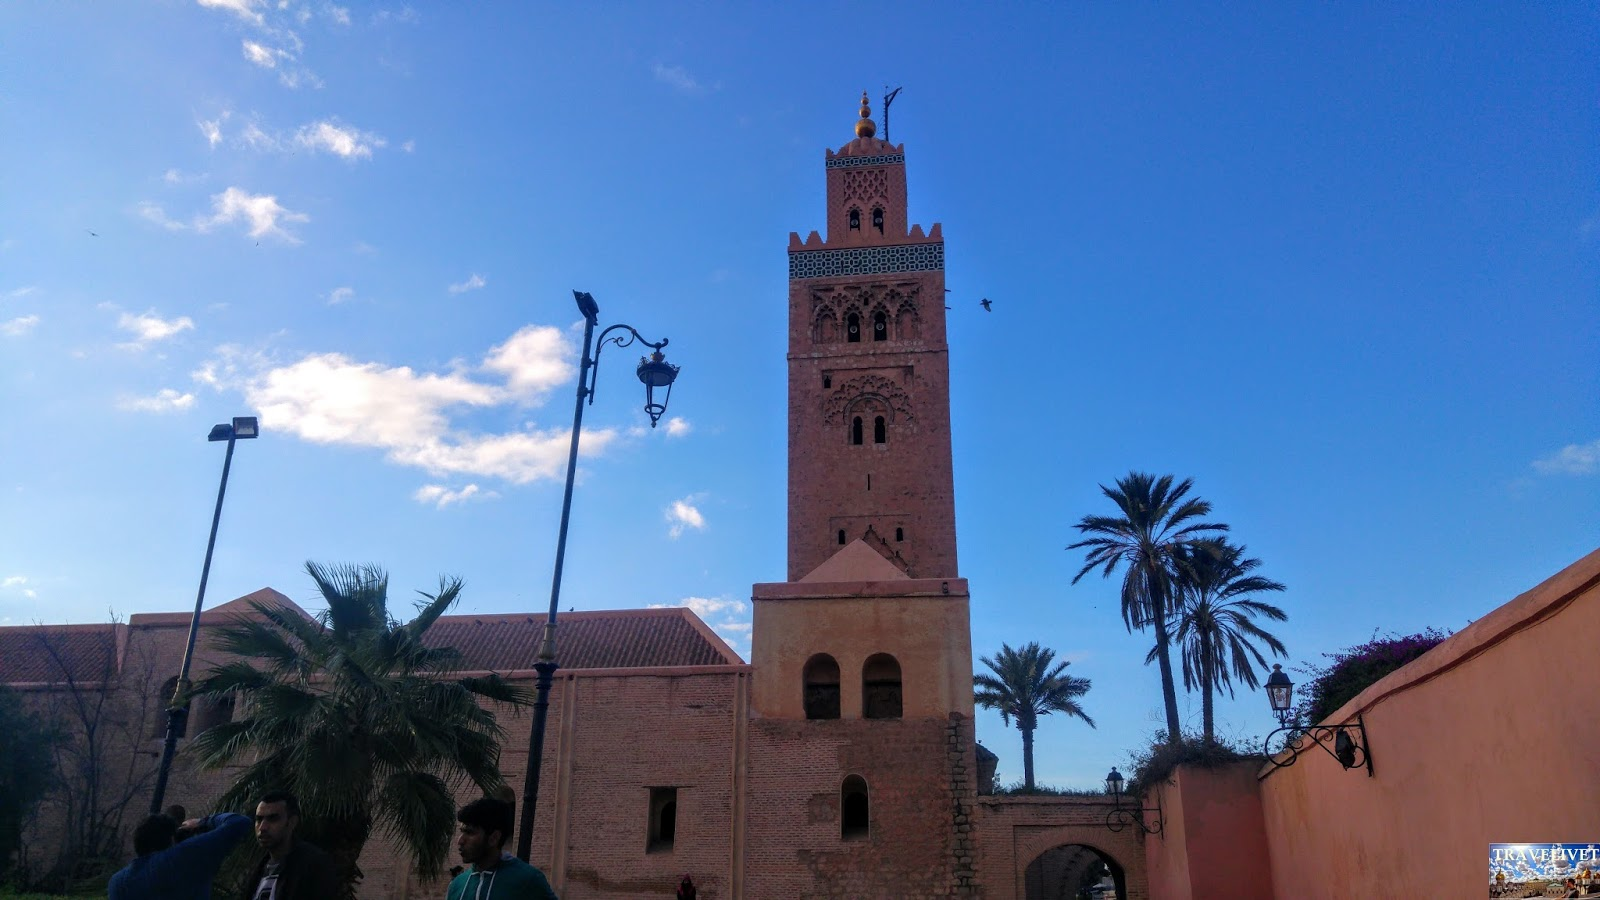 Maroc Marrakech Minaret de la Koutoubia